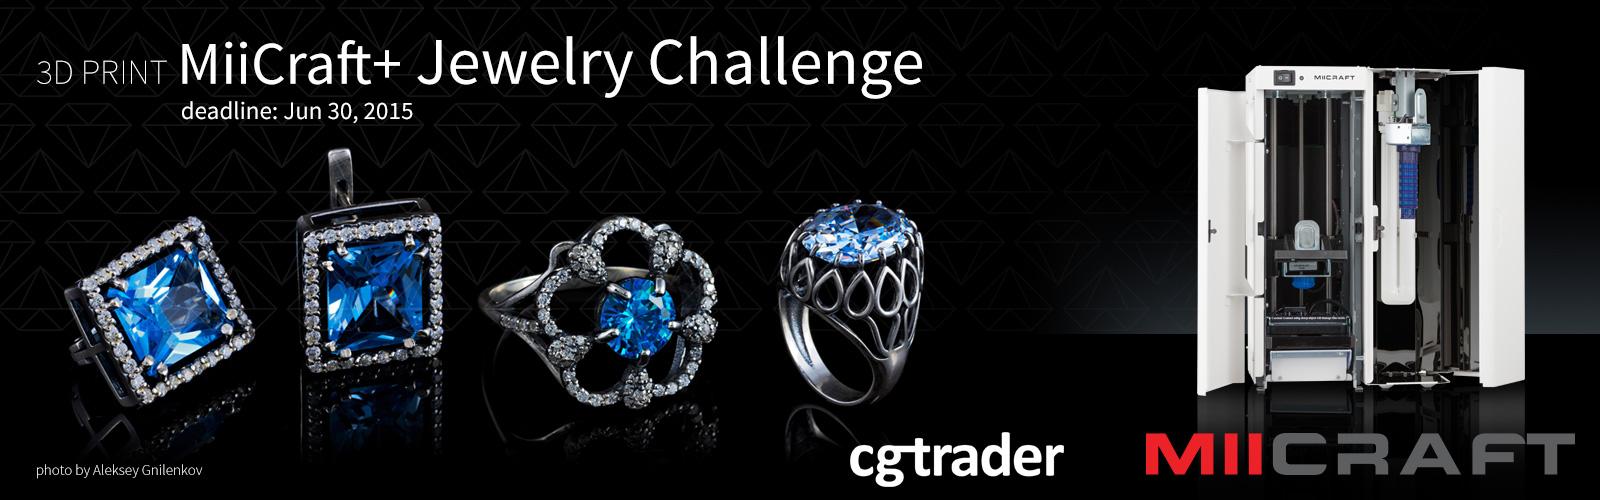 3D Print Miicraft+ Jewelry Challenge